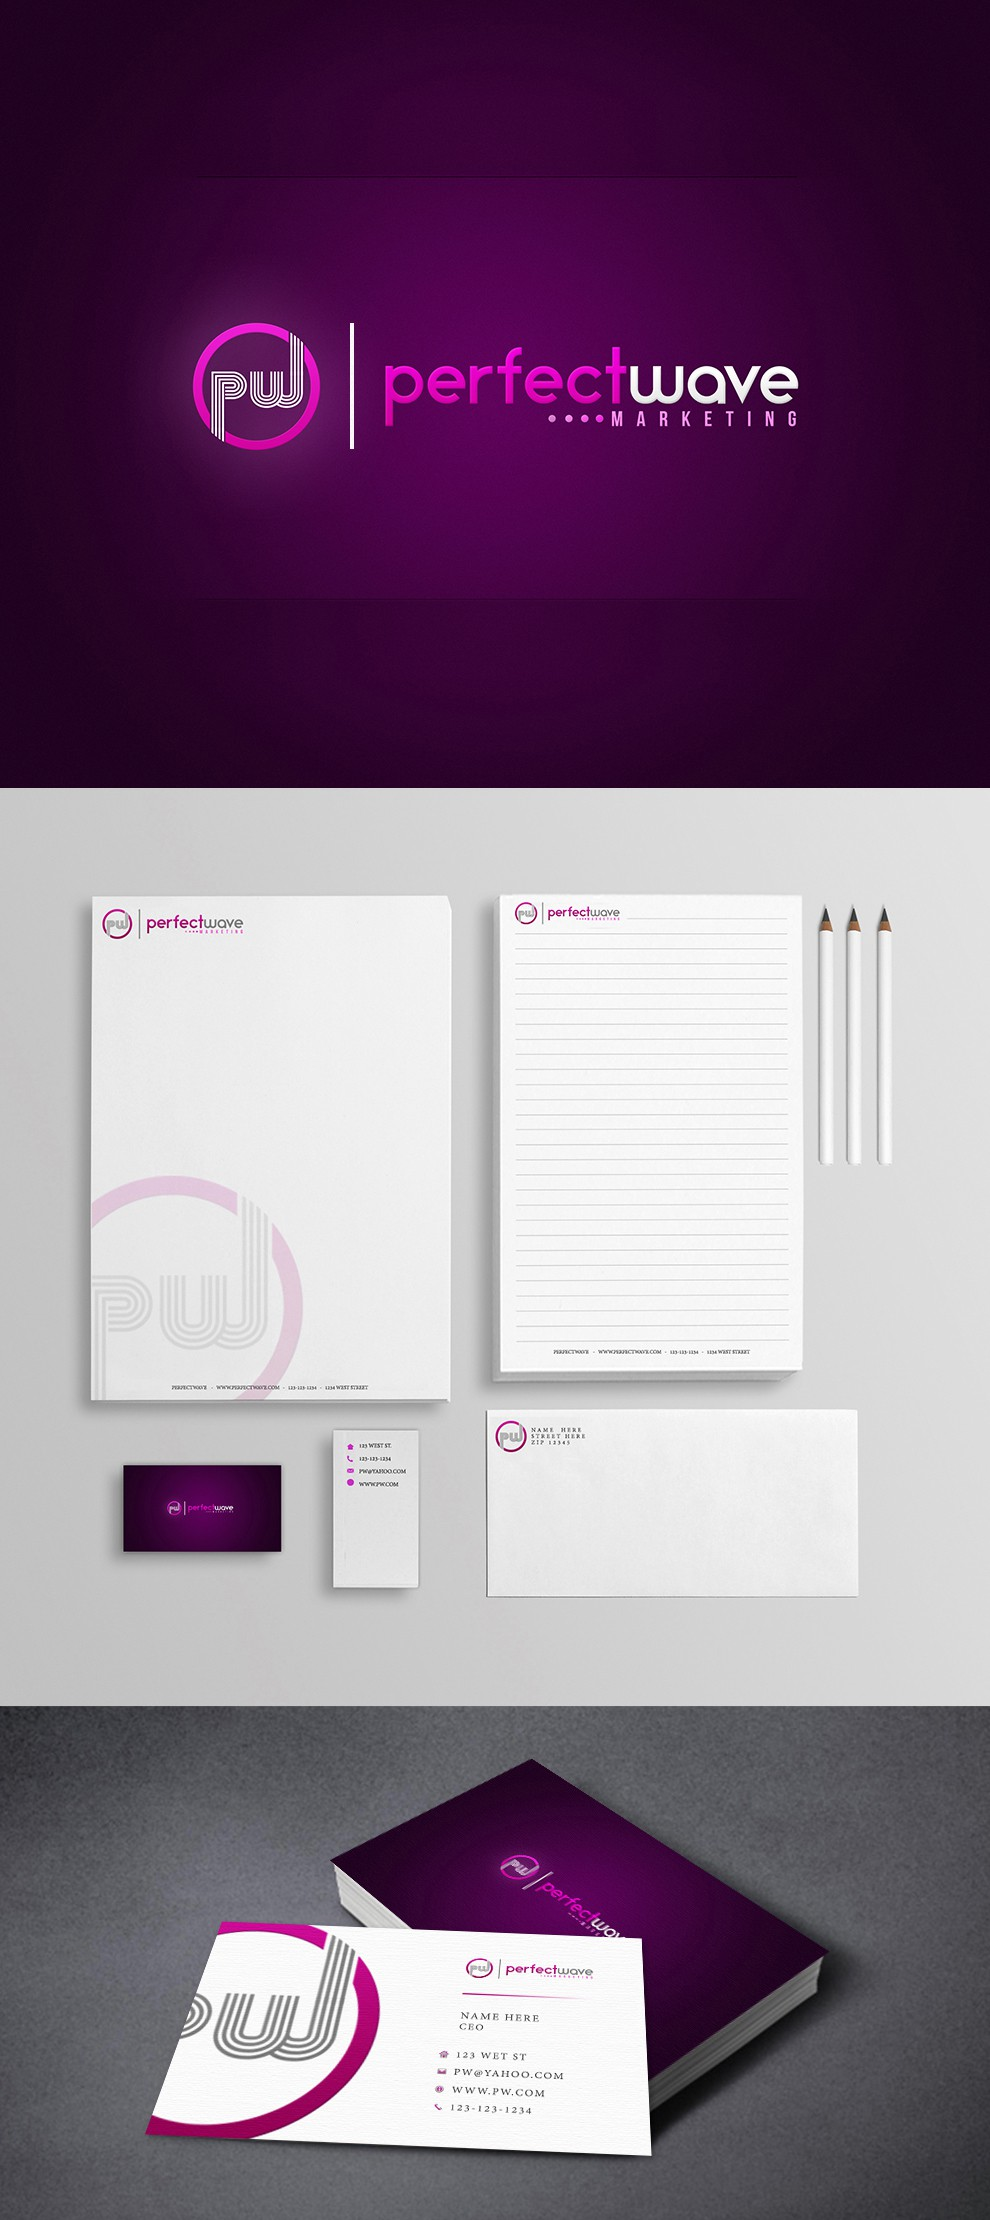 Perfect Wave Marketing needs a new logo